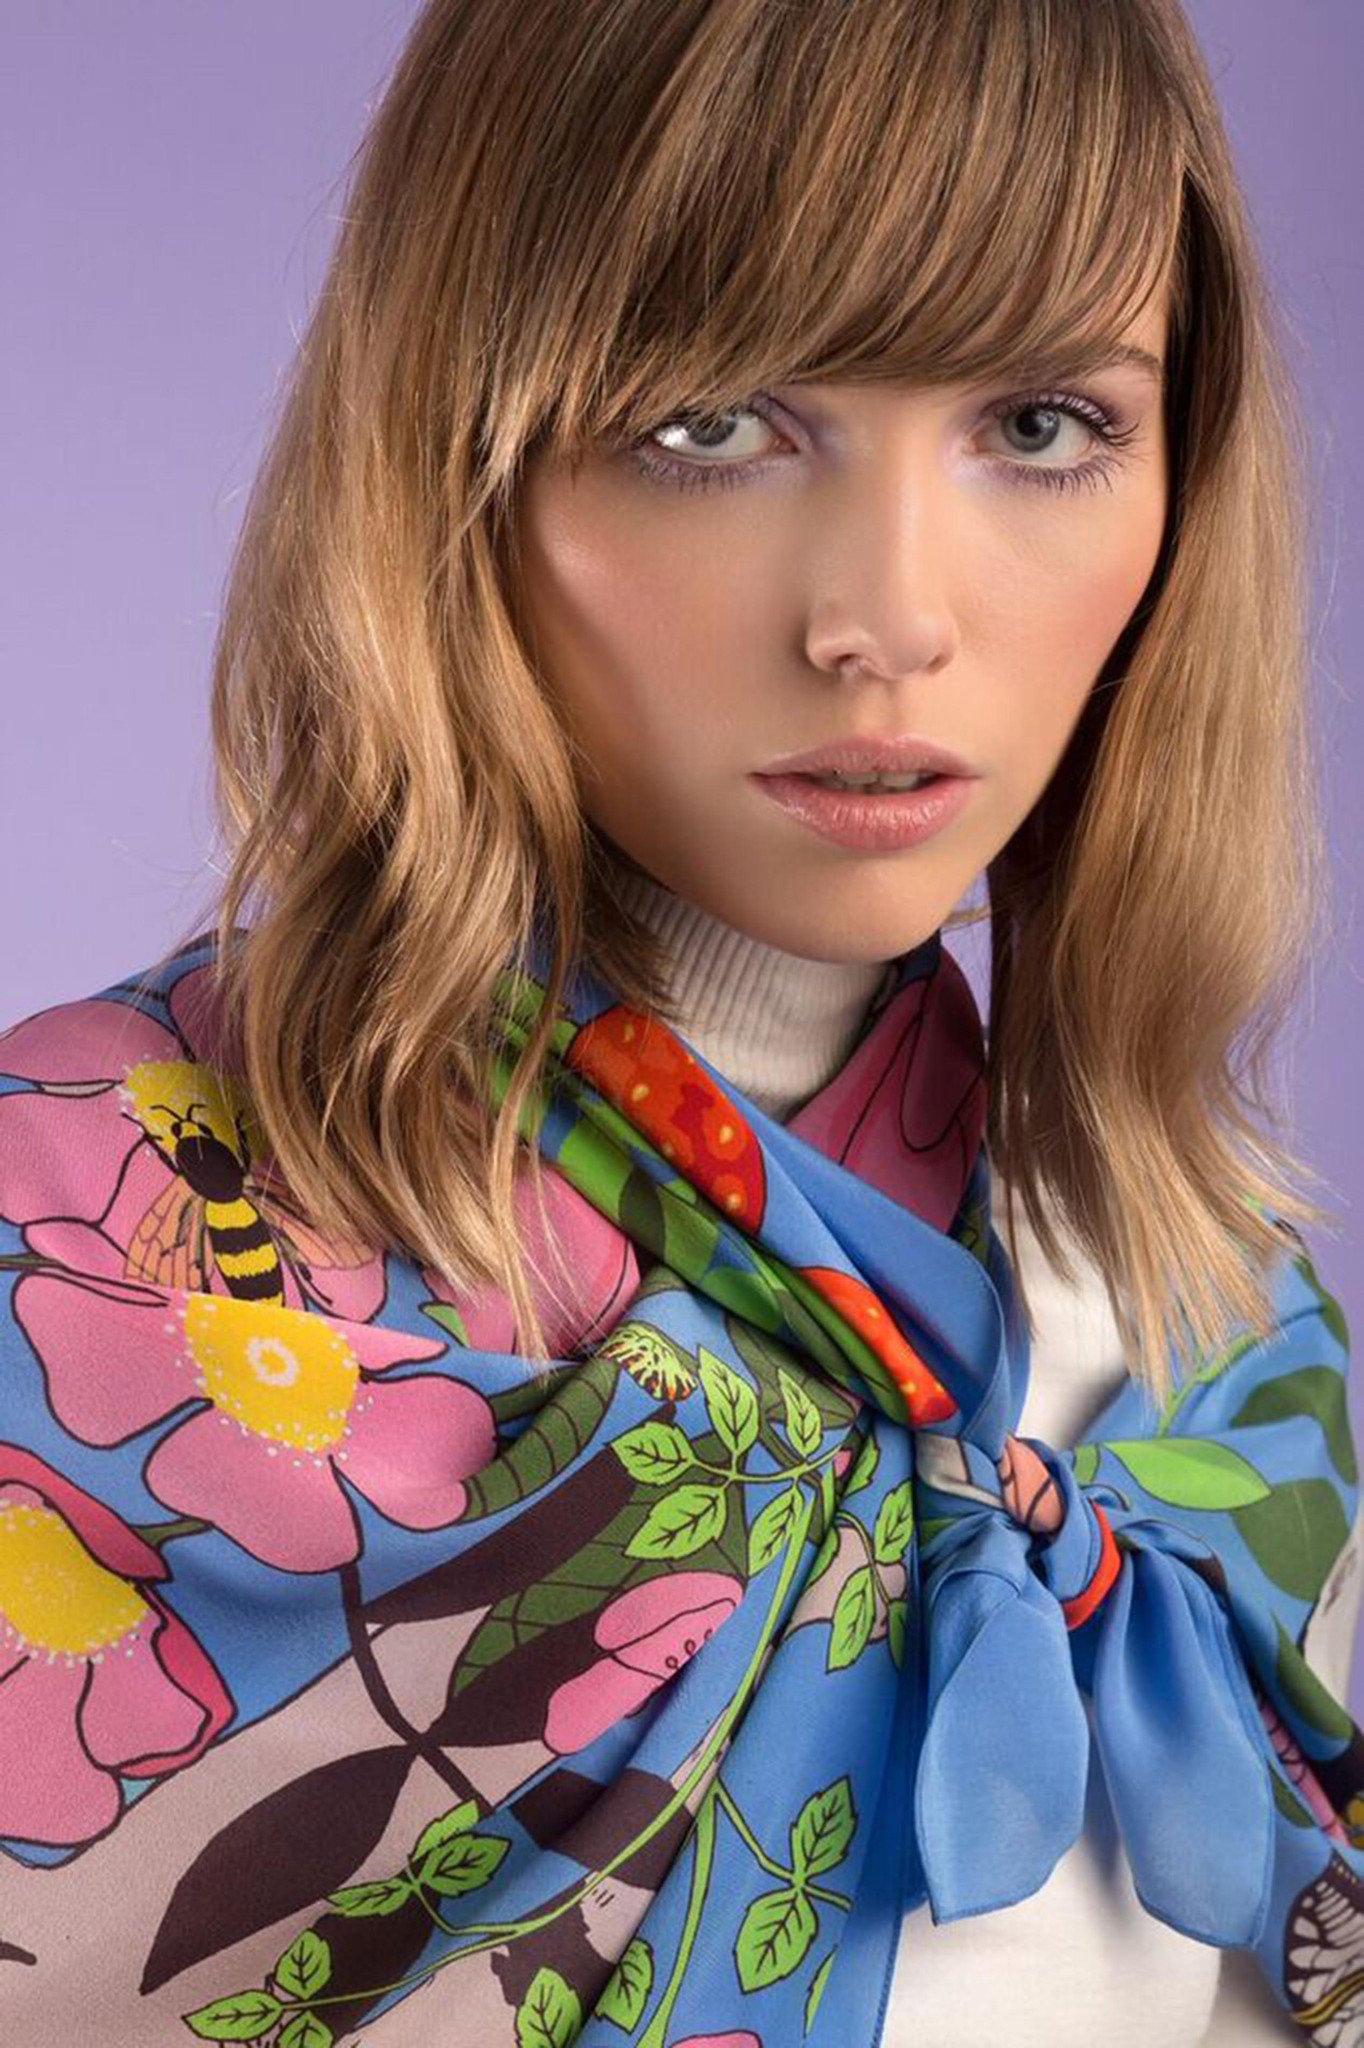 【Grace Boutique】100% silk 英國品牌 Karen Mabon 絲質披肩 義大利製